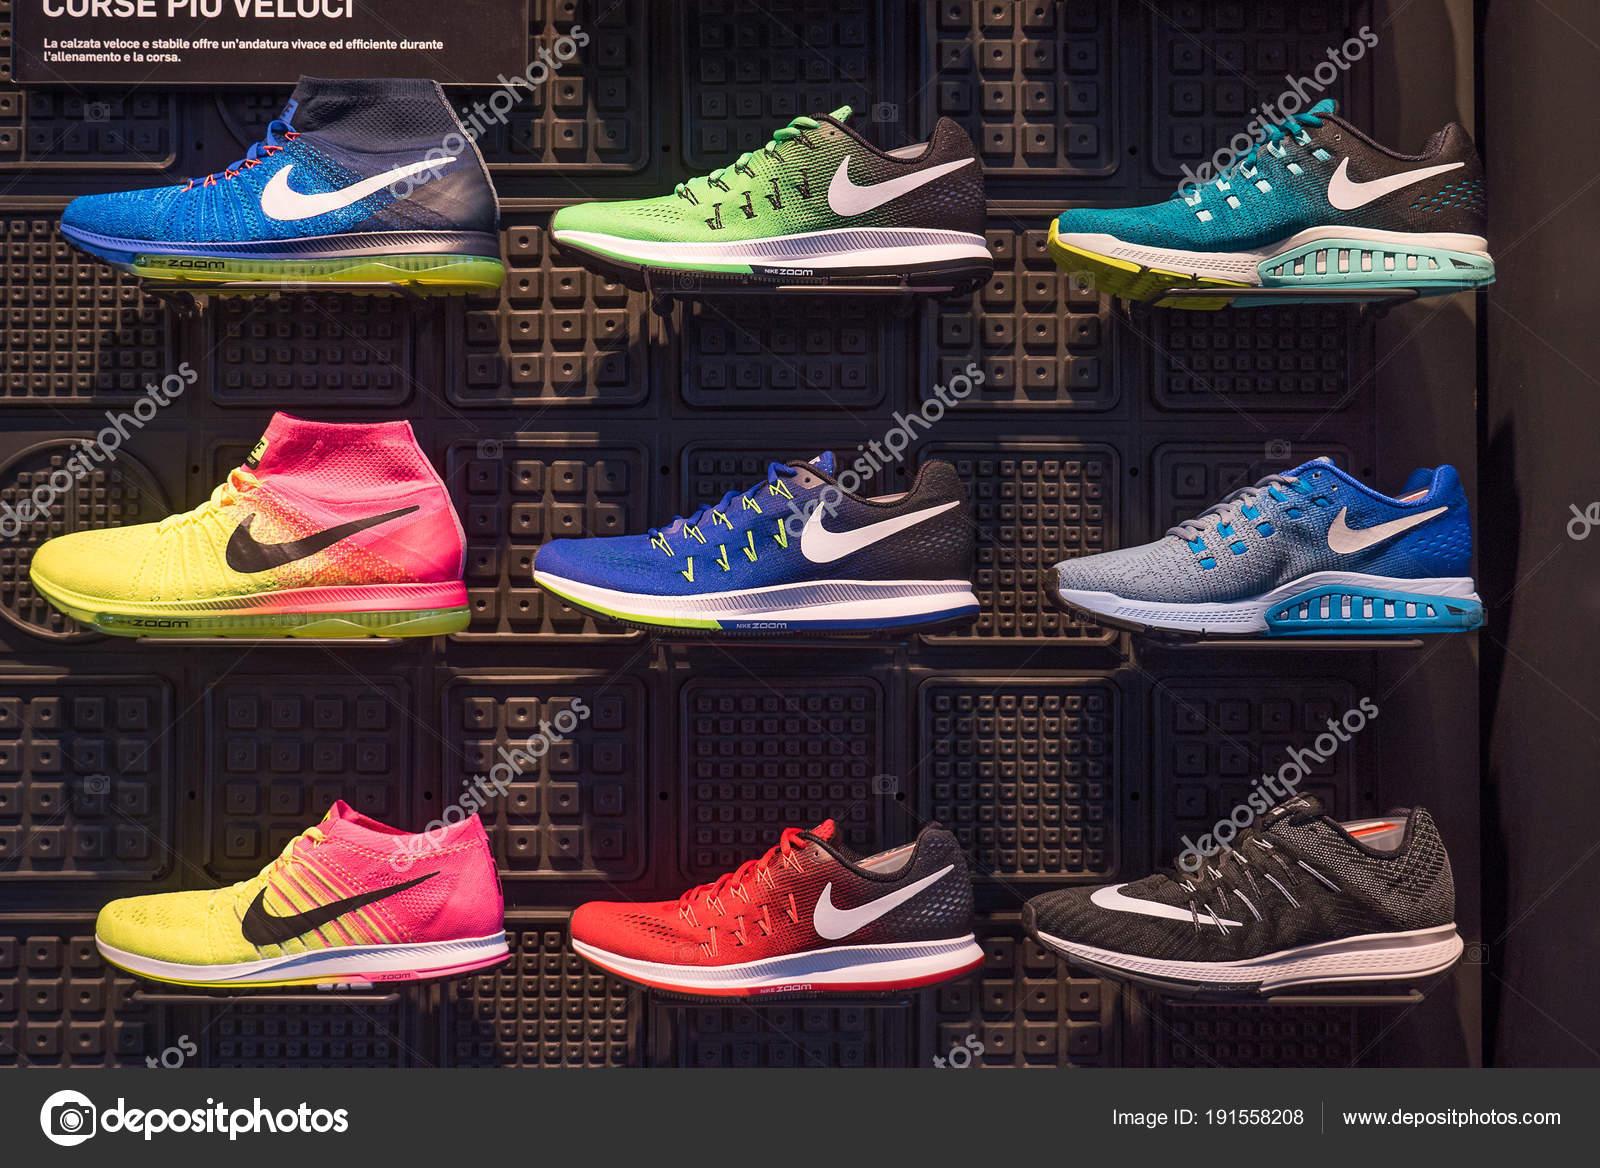 9e6a068d5a6 Μιλάνο, Ιταλία - 27 Σεπτέμβριος 2016: Έκθεση του nike αθλητικά παπούτσια.  Nike είναι ένας από τους παγκόσμιους μεγαλύτερους προμηθευτές αθλητικά  παπούτσια ...